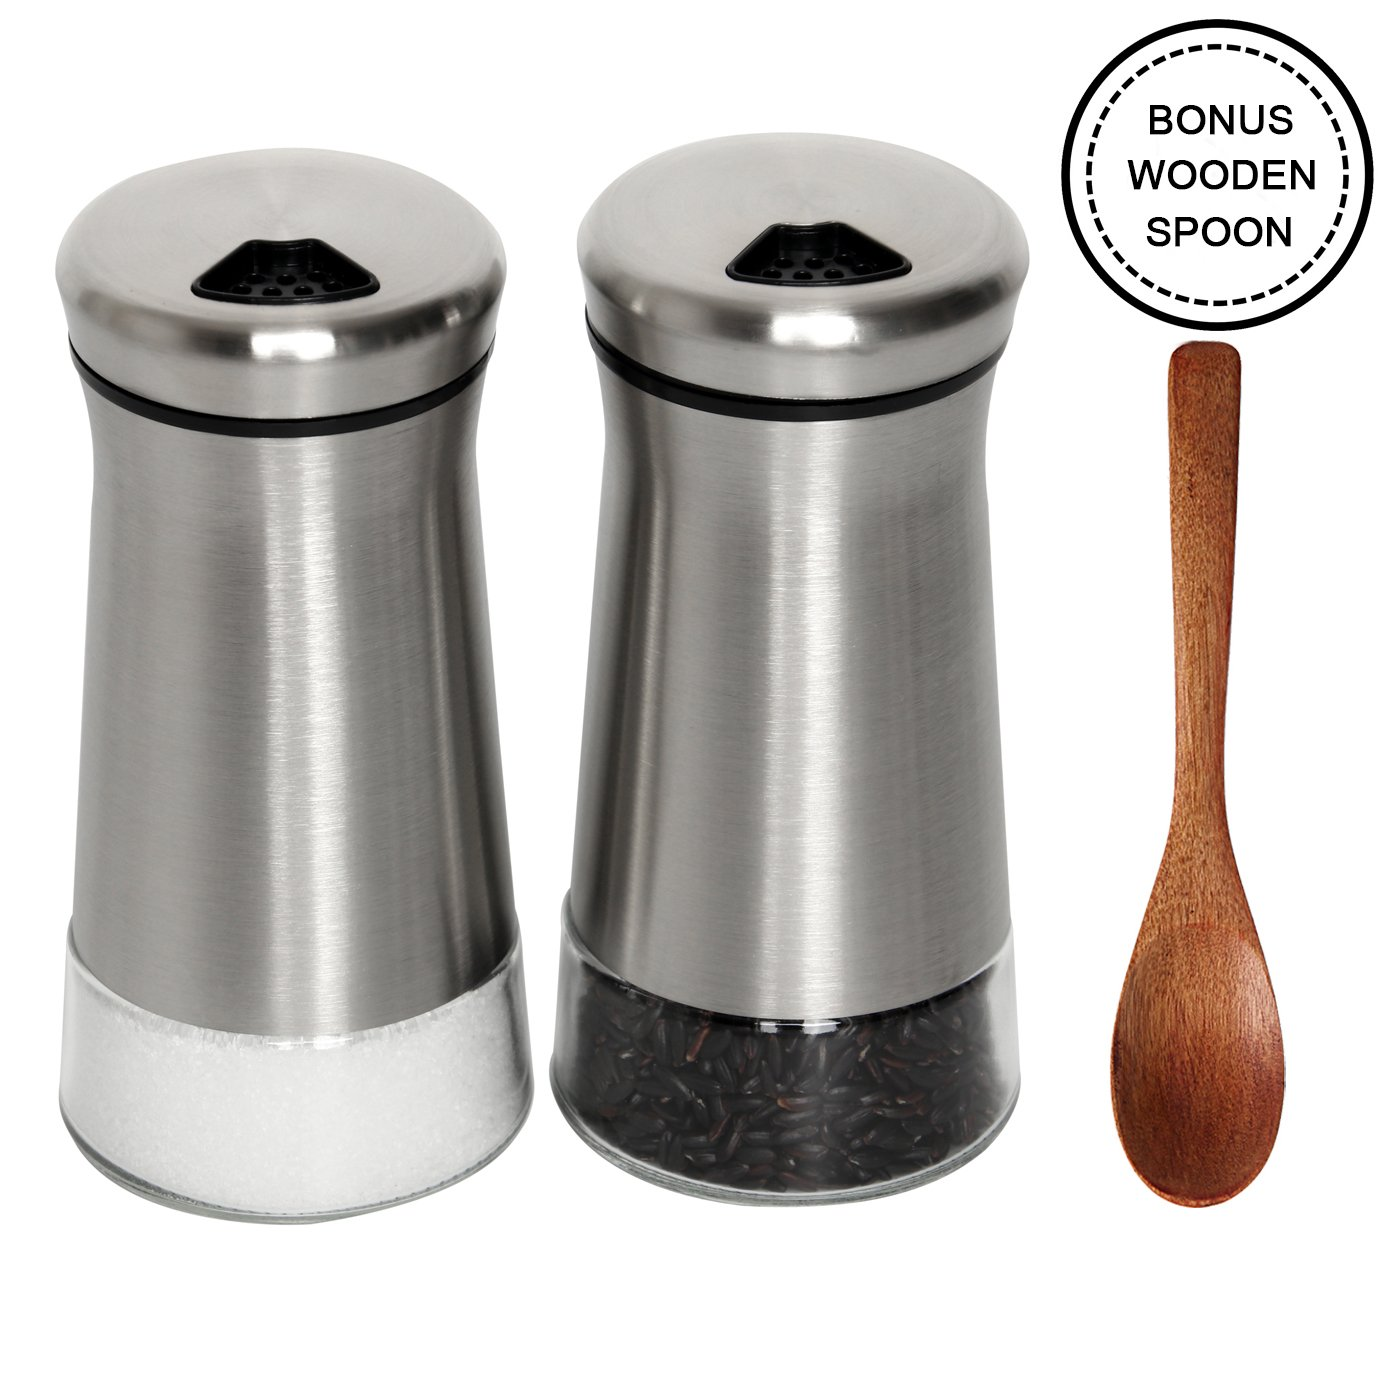 SILUKER Salt and Pepper Shakers Set with Adjustable Pour Holes - High Grade Stainless Steel with Glass Bottom - Salt Shaker + Bonus Wooden Spoon(Silver)